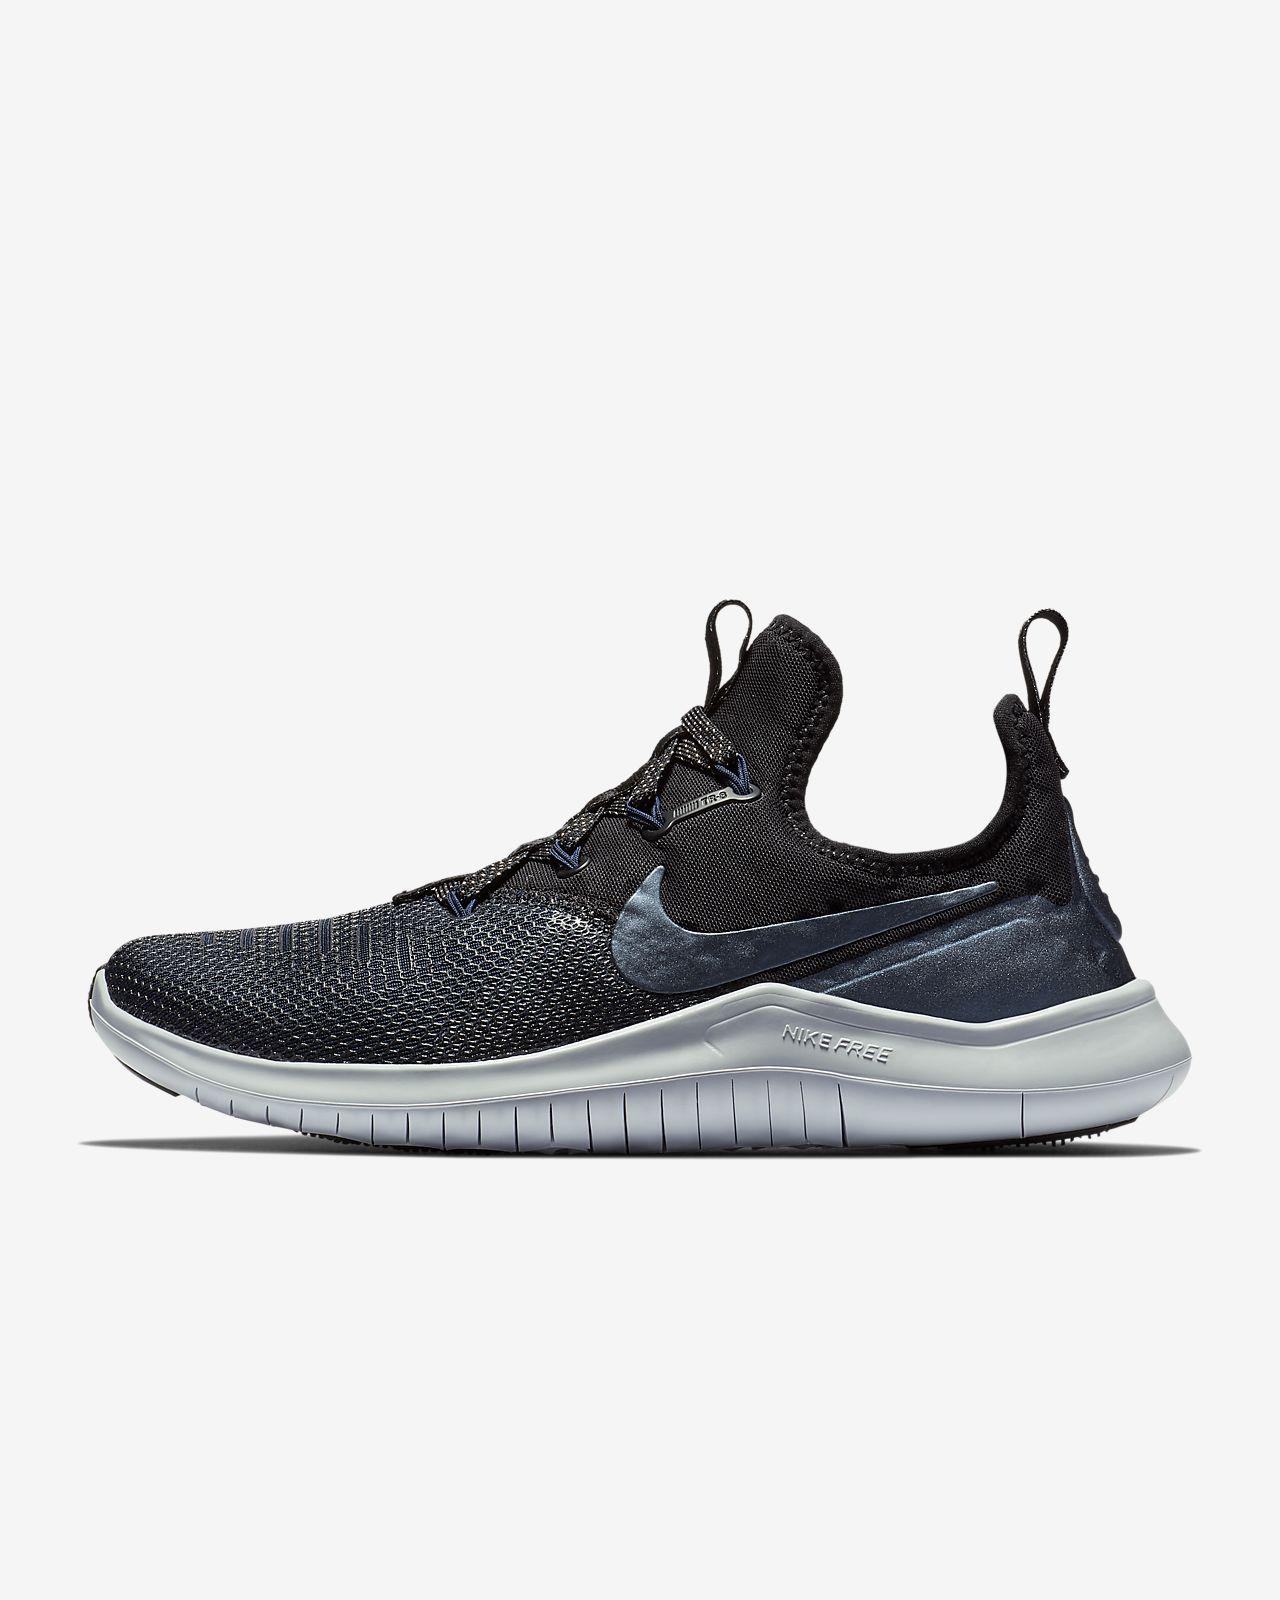 cheap for discount a2a5c 9bdc8 ... Scarpa da training Nike Free TR 8 Metallic - Donna